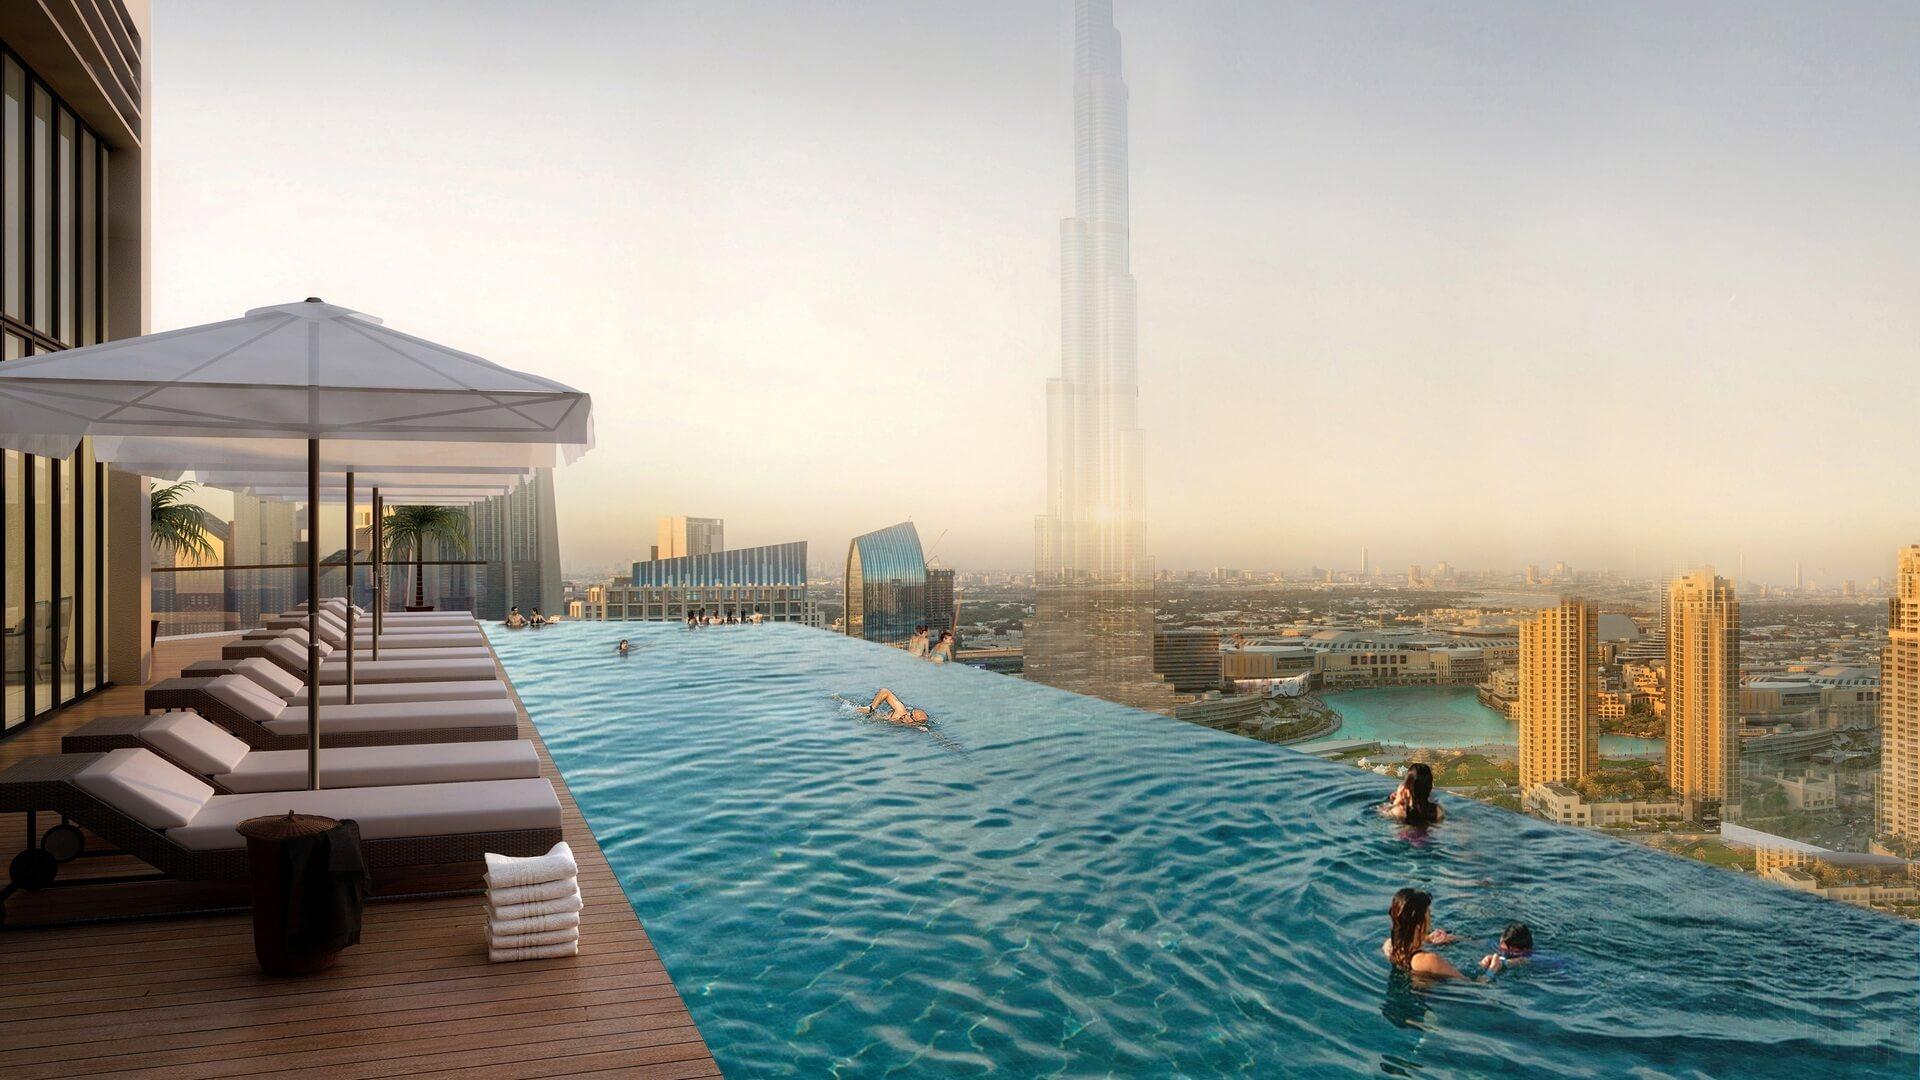 PARAMOUNT TOWER HOTEL & RESIDENCES, Business Bay, Dubai, UAE – photo 2